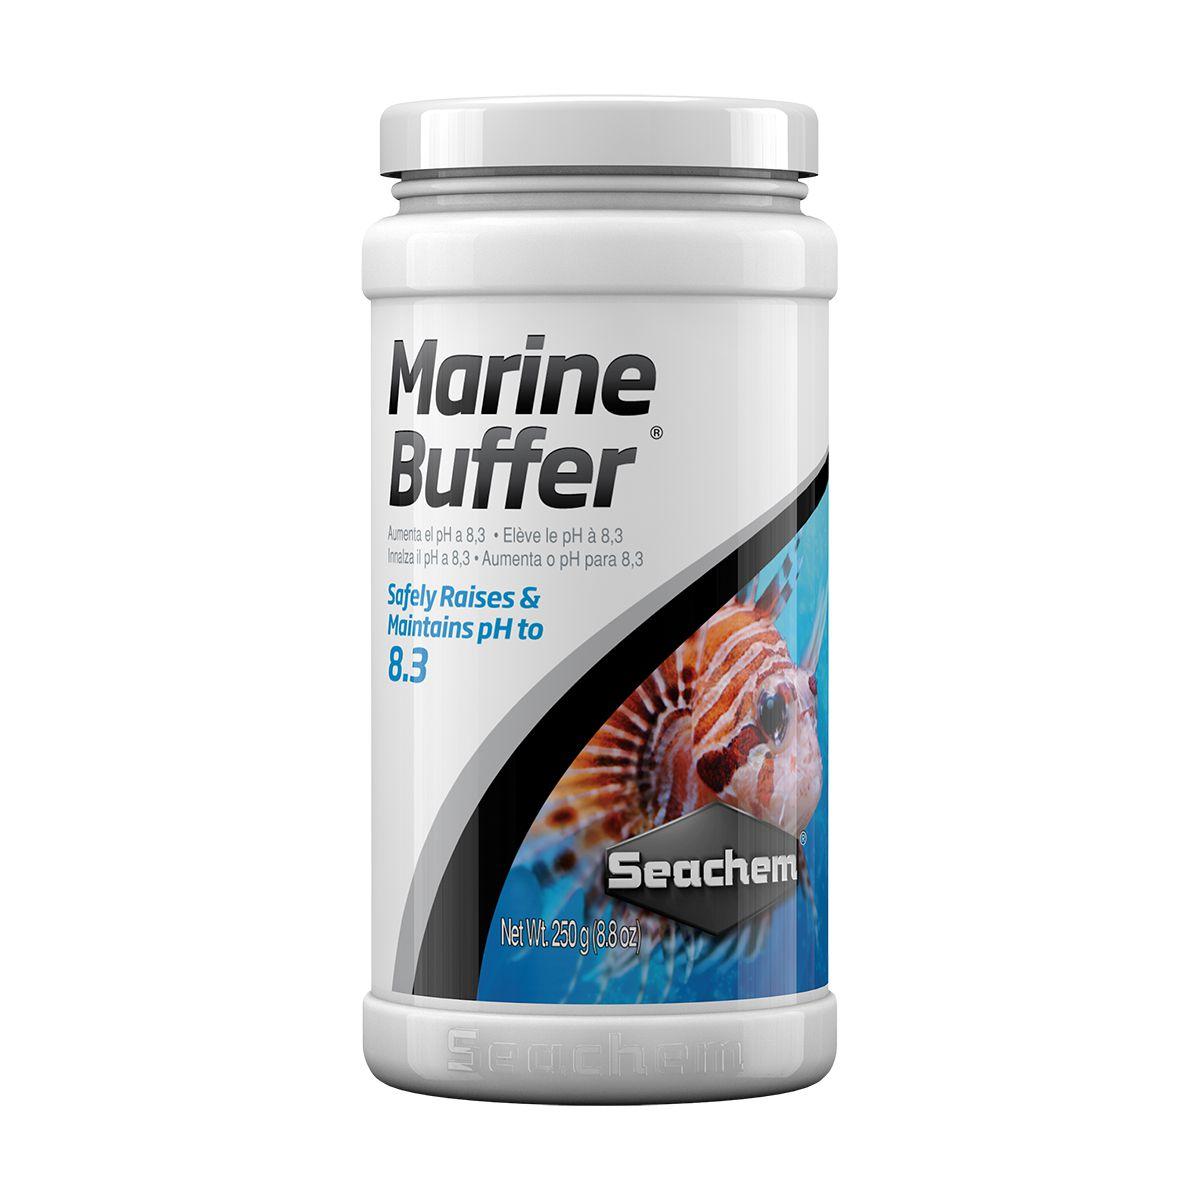 Seachem Marine Buffer 250g Regula e Mantém o pH Marinho 8,3